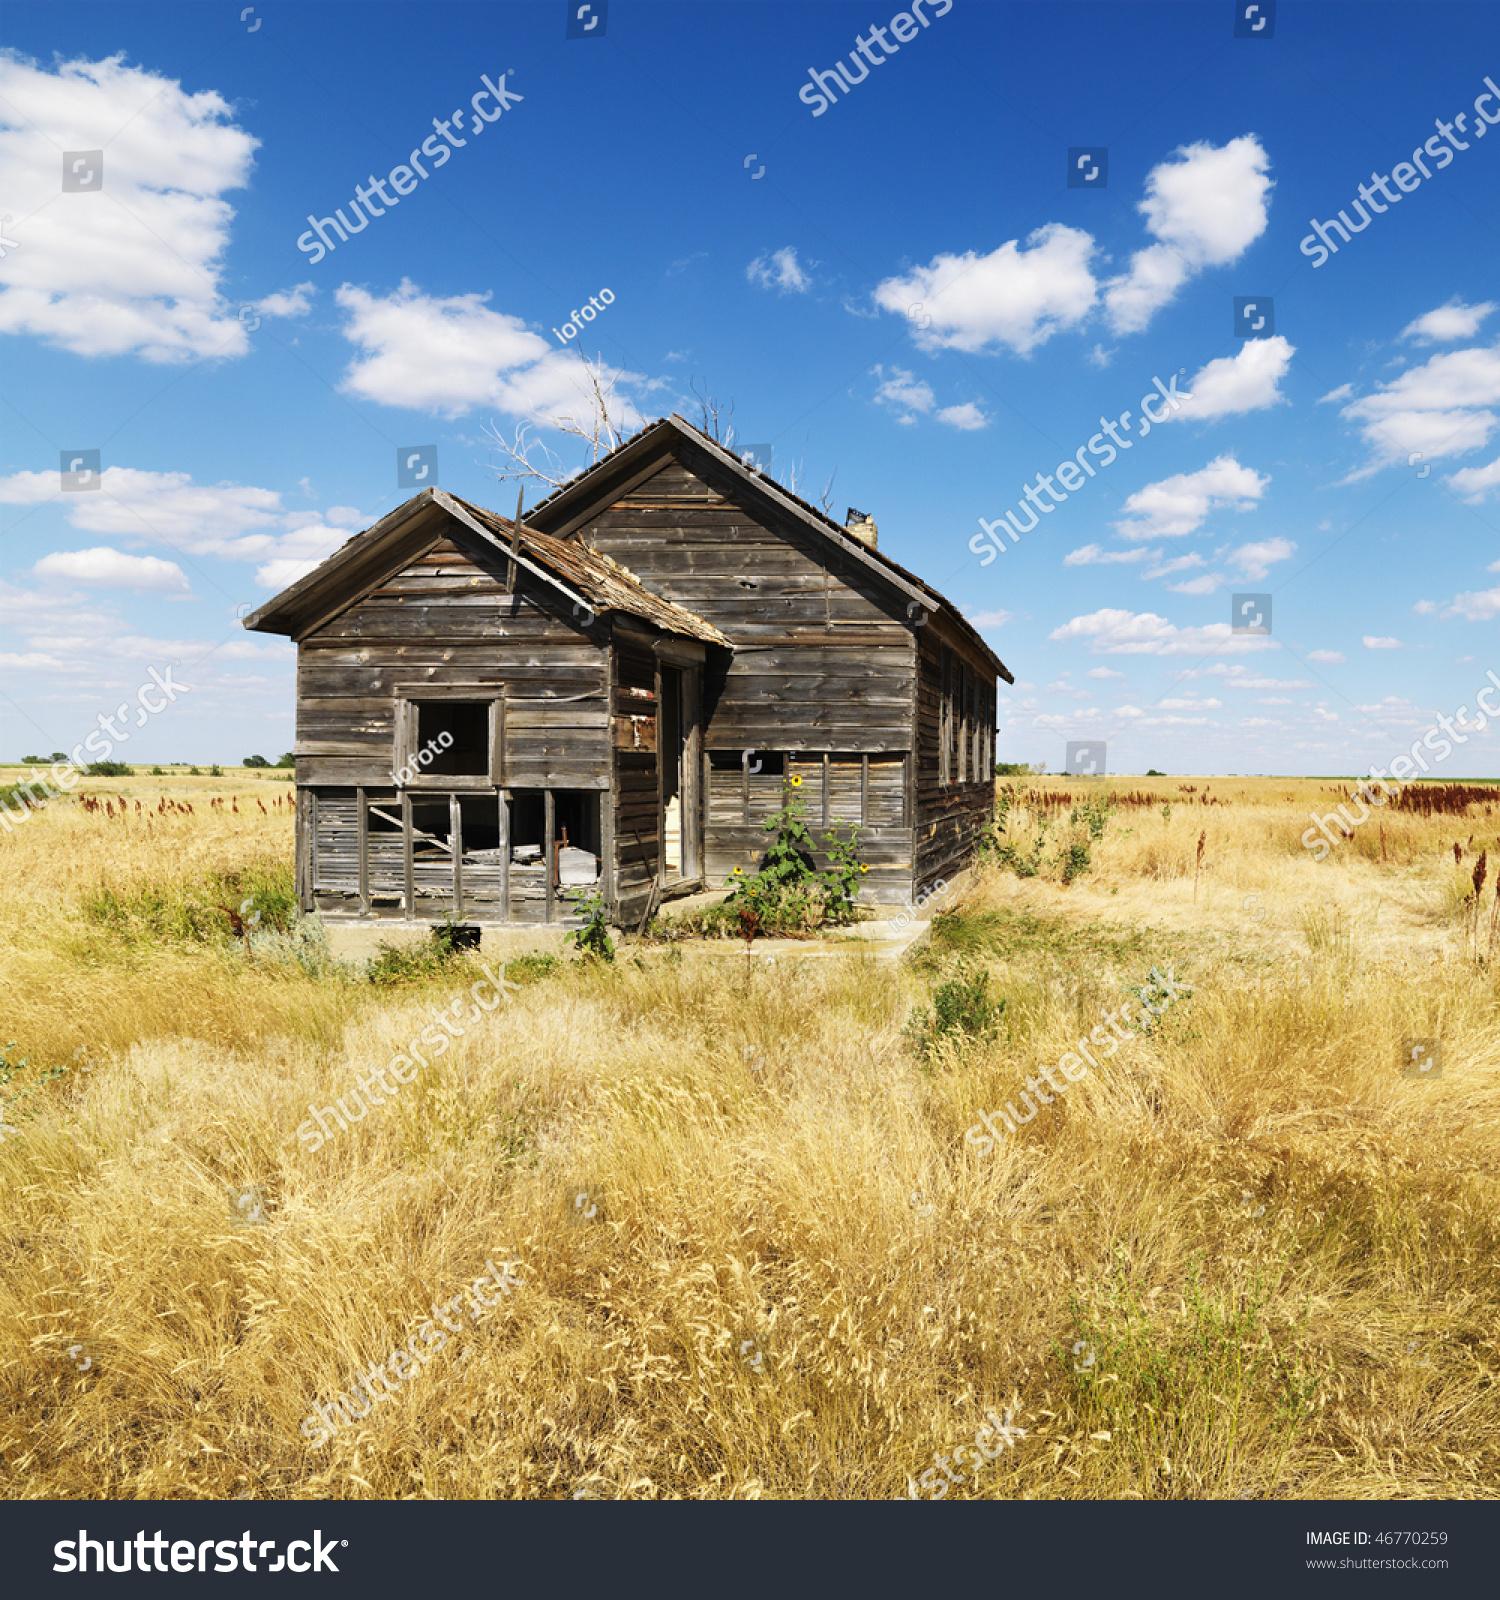 Abandoned House In State Of Disrepair In Field In Rural